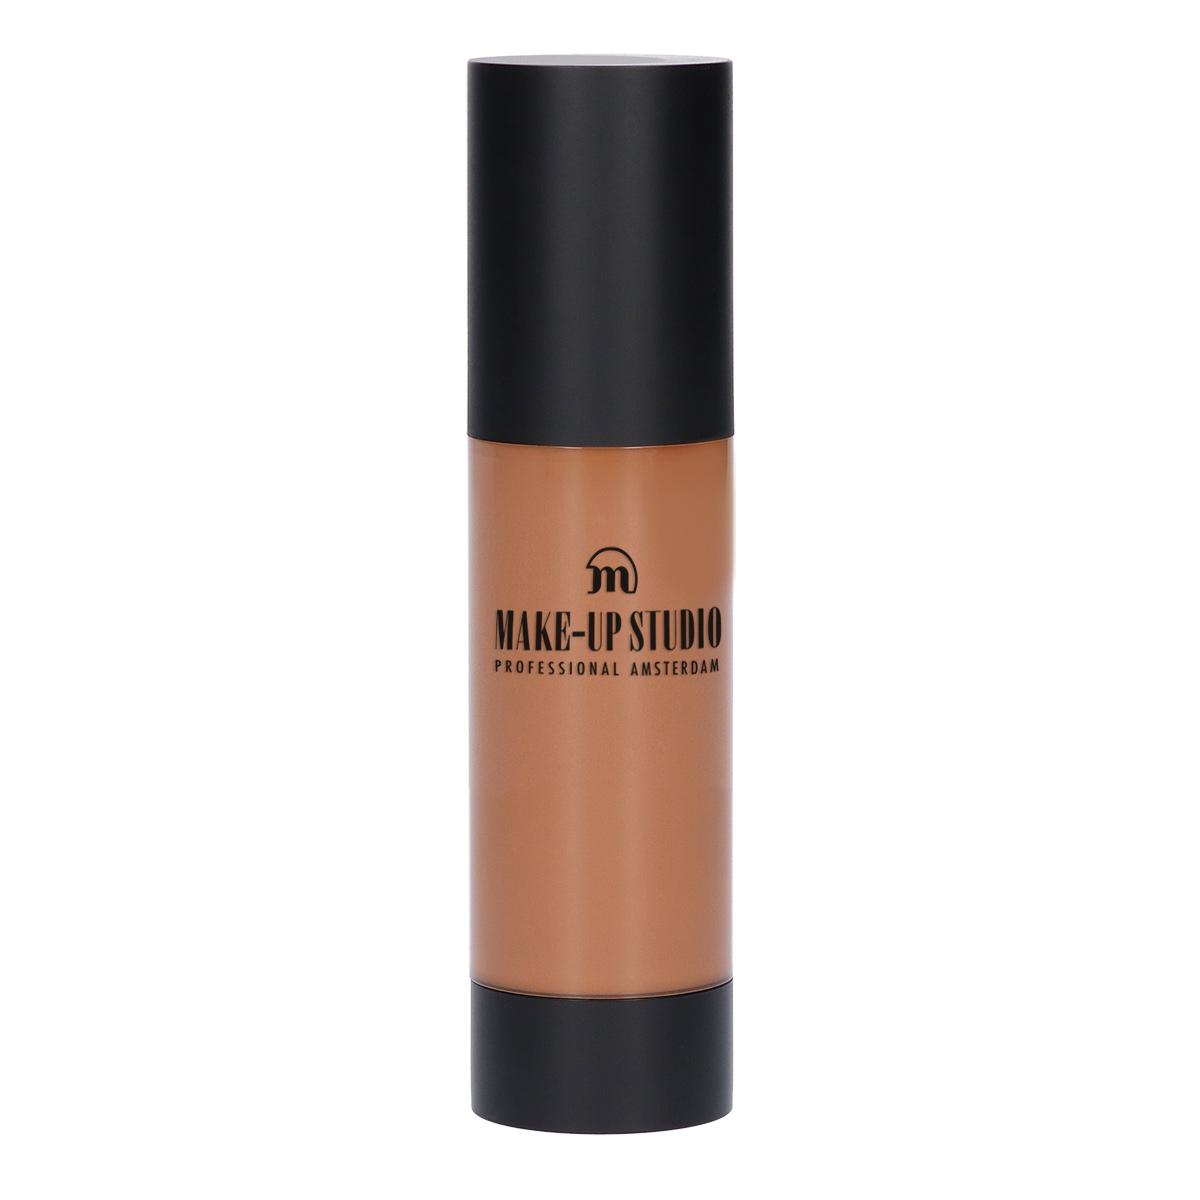 Fluid Foundation No Transfer - WB5 Olive Tan